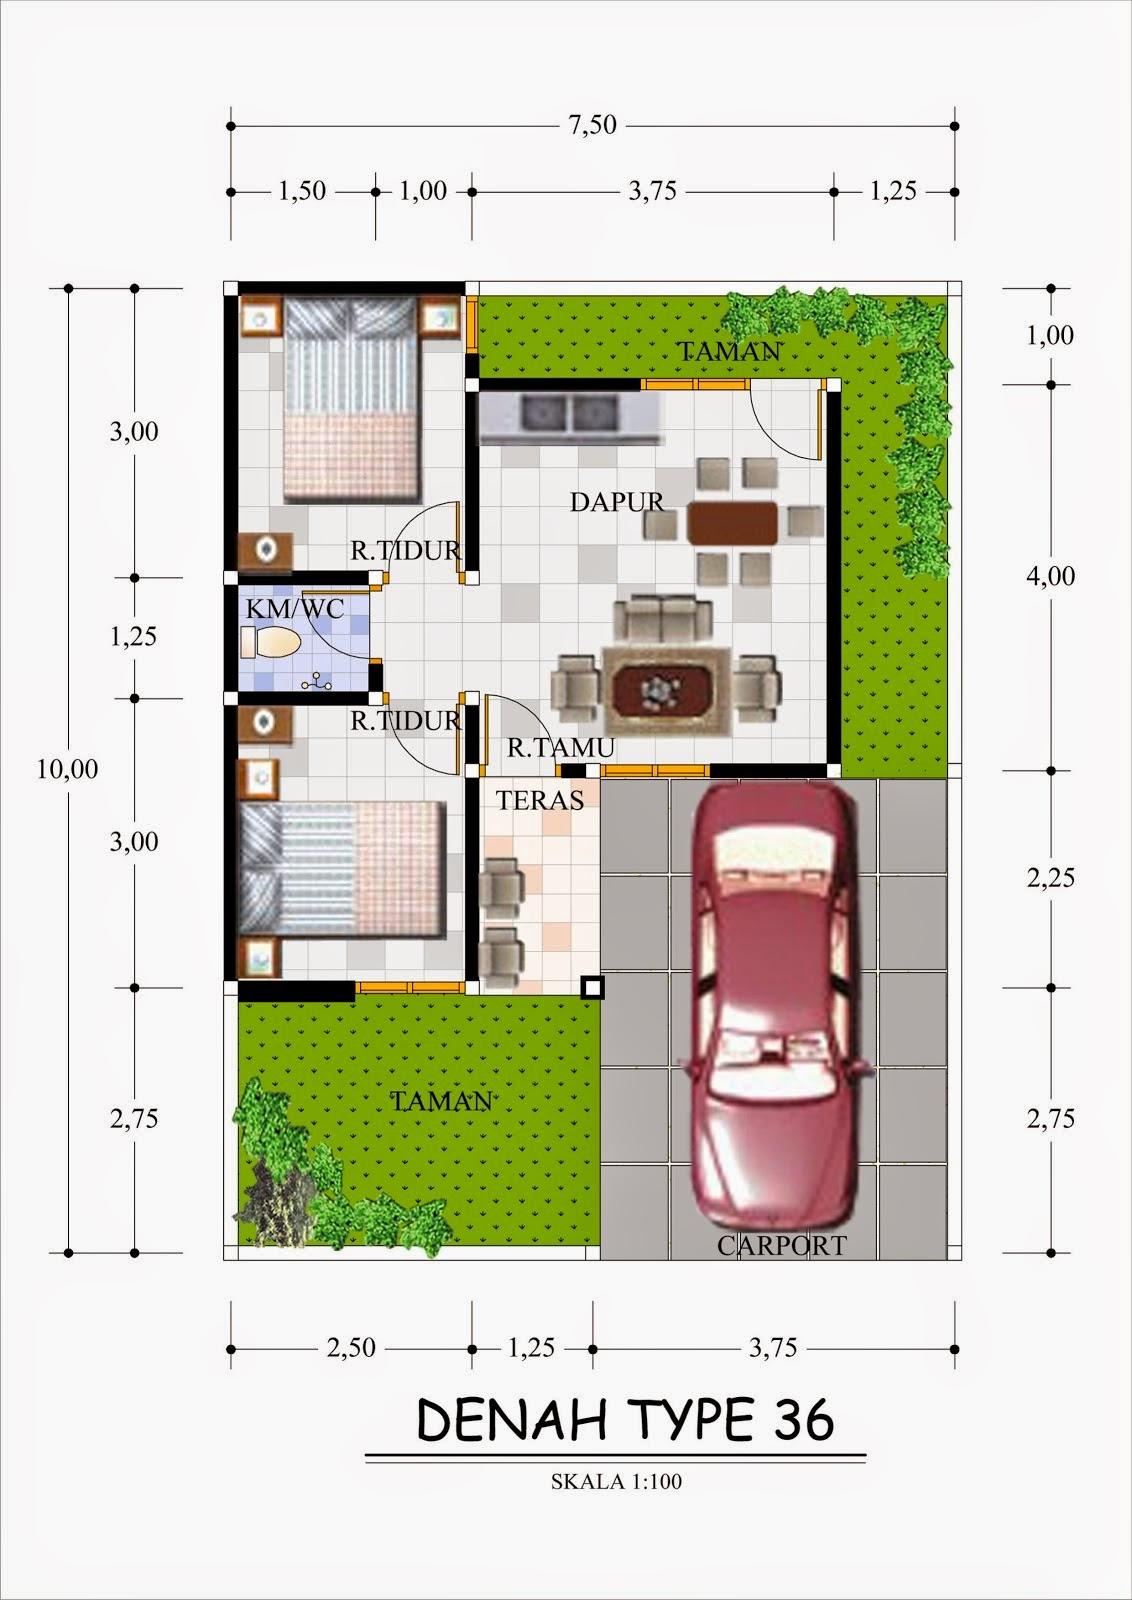 Home Art Design Sample Image Minimalist House Plan Type 36 Trend 2015 Denah rumah type 36